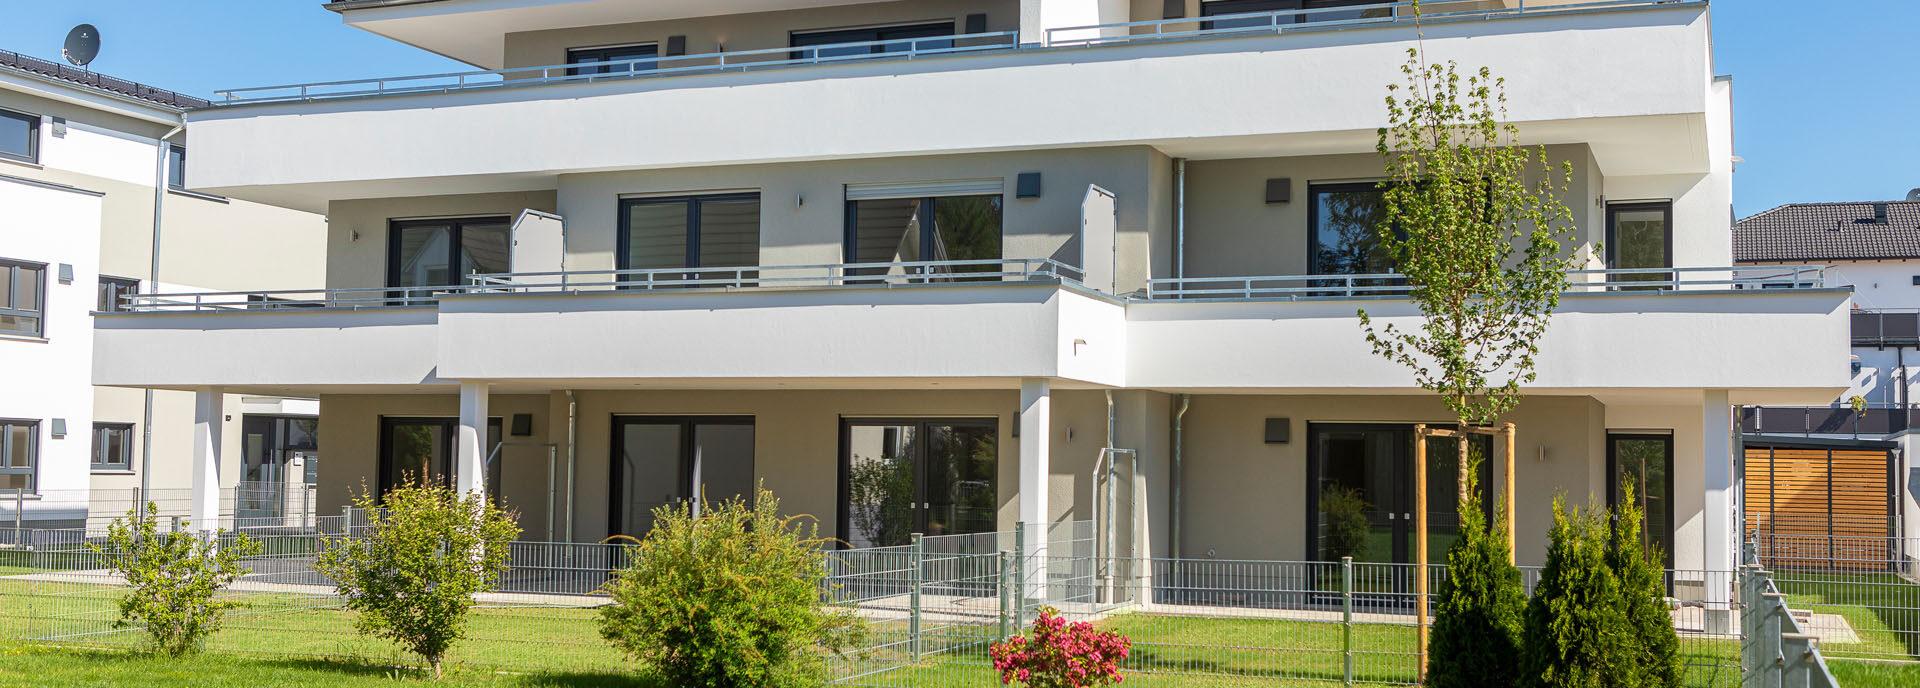 Communis Projektbau - Untermeitingen 071